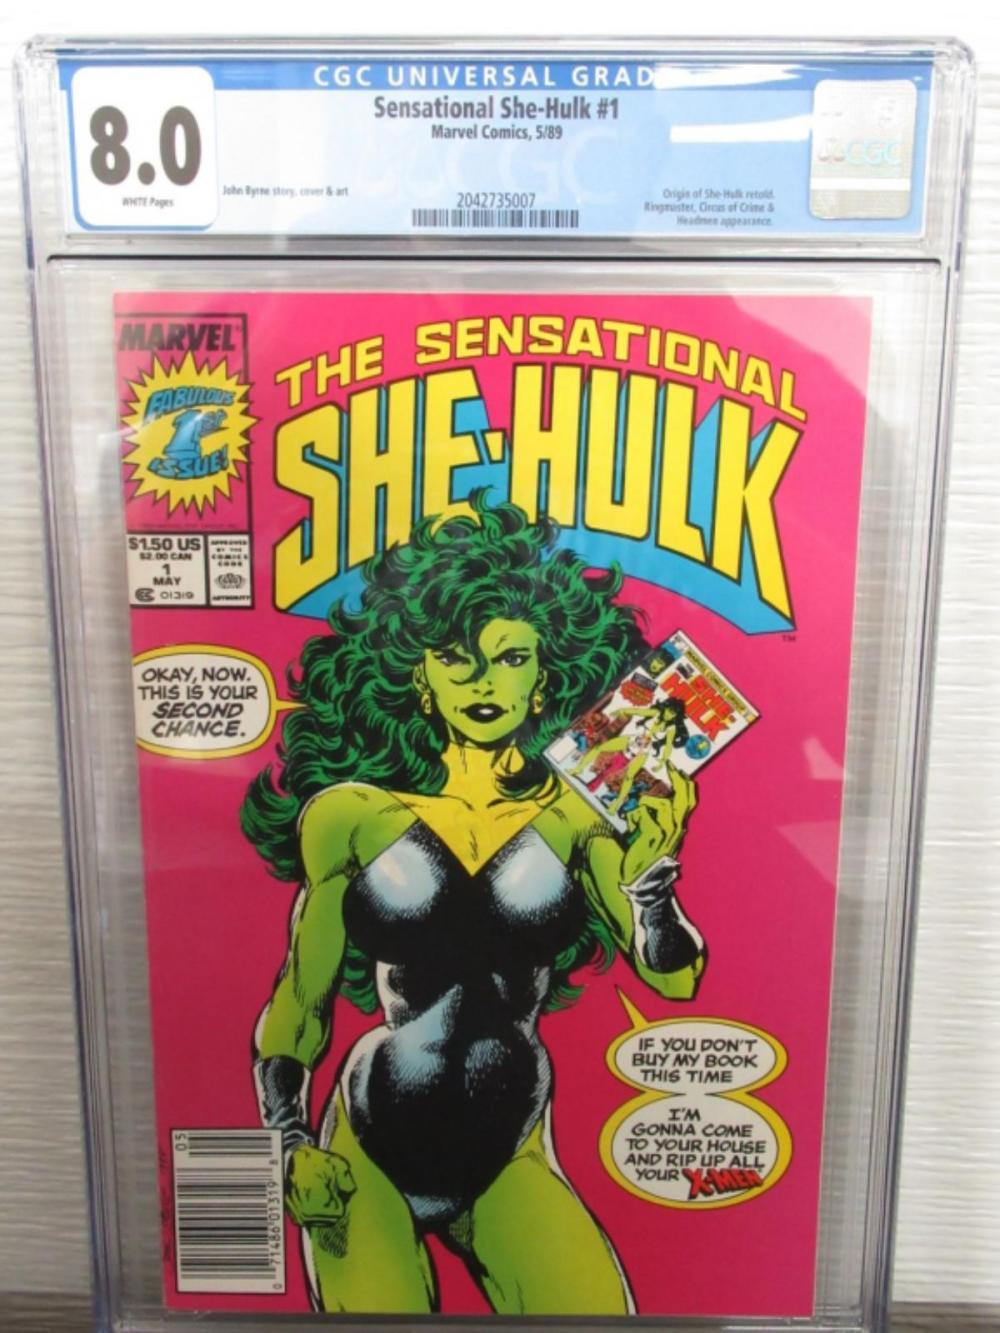 Sensational She-Hulk #1 Origin, Retold Ringmaster